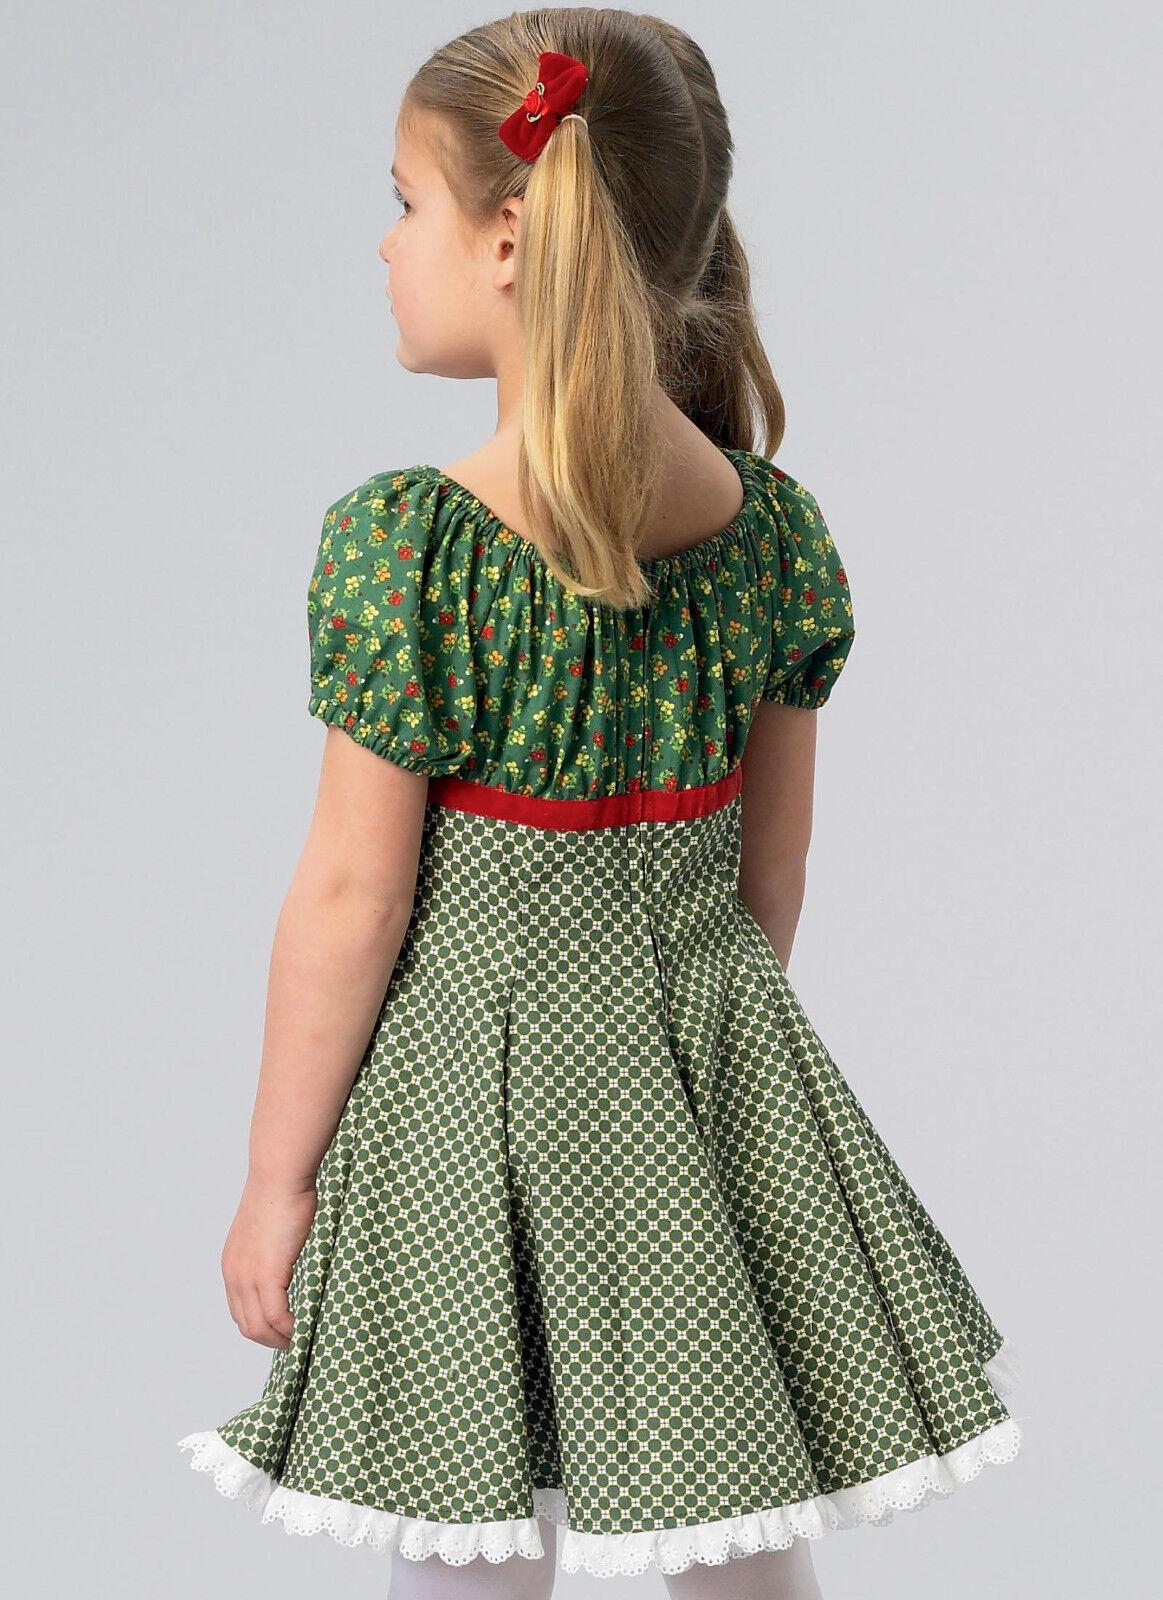 Ellie Mae Designs K185 Sweet Party Dresses Size 3-10 Long Short Sleeve Pretty